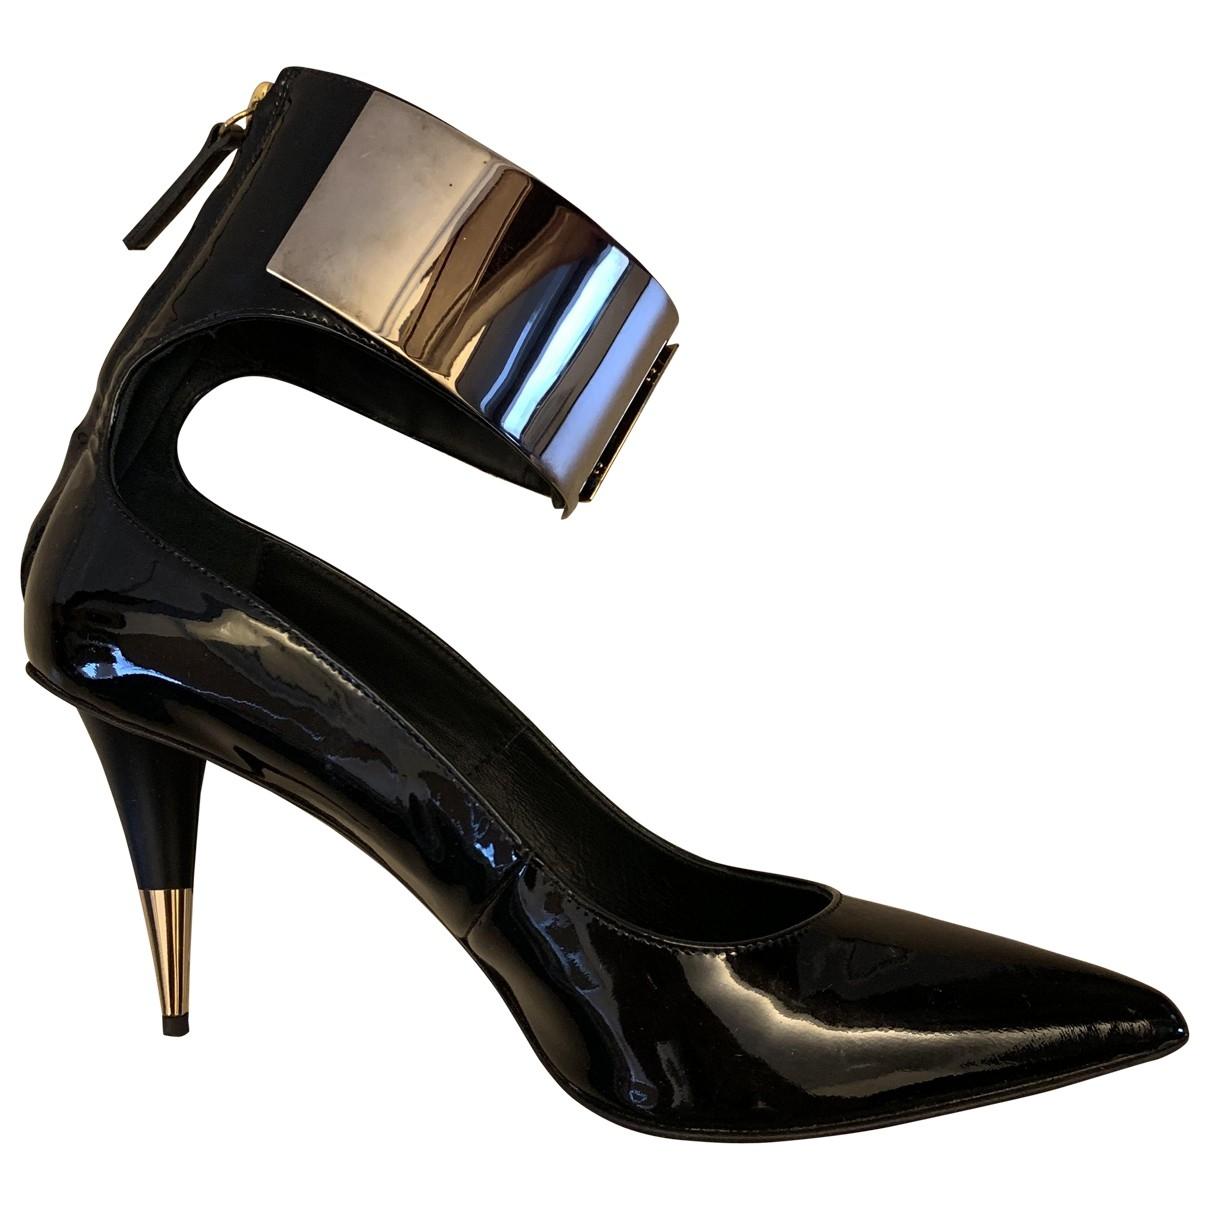 Giuseppe Zanotti - Escarpins   pour femme en cuir verni - noir